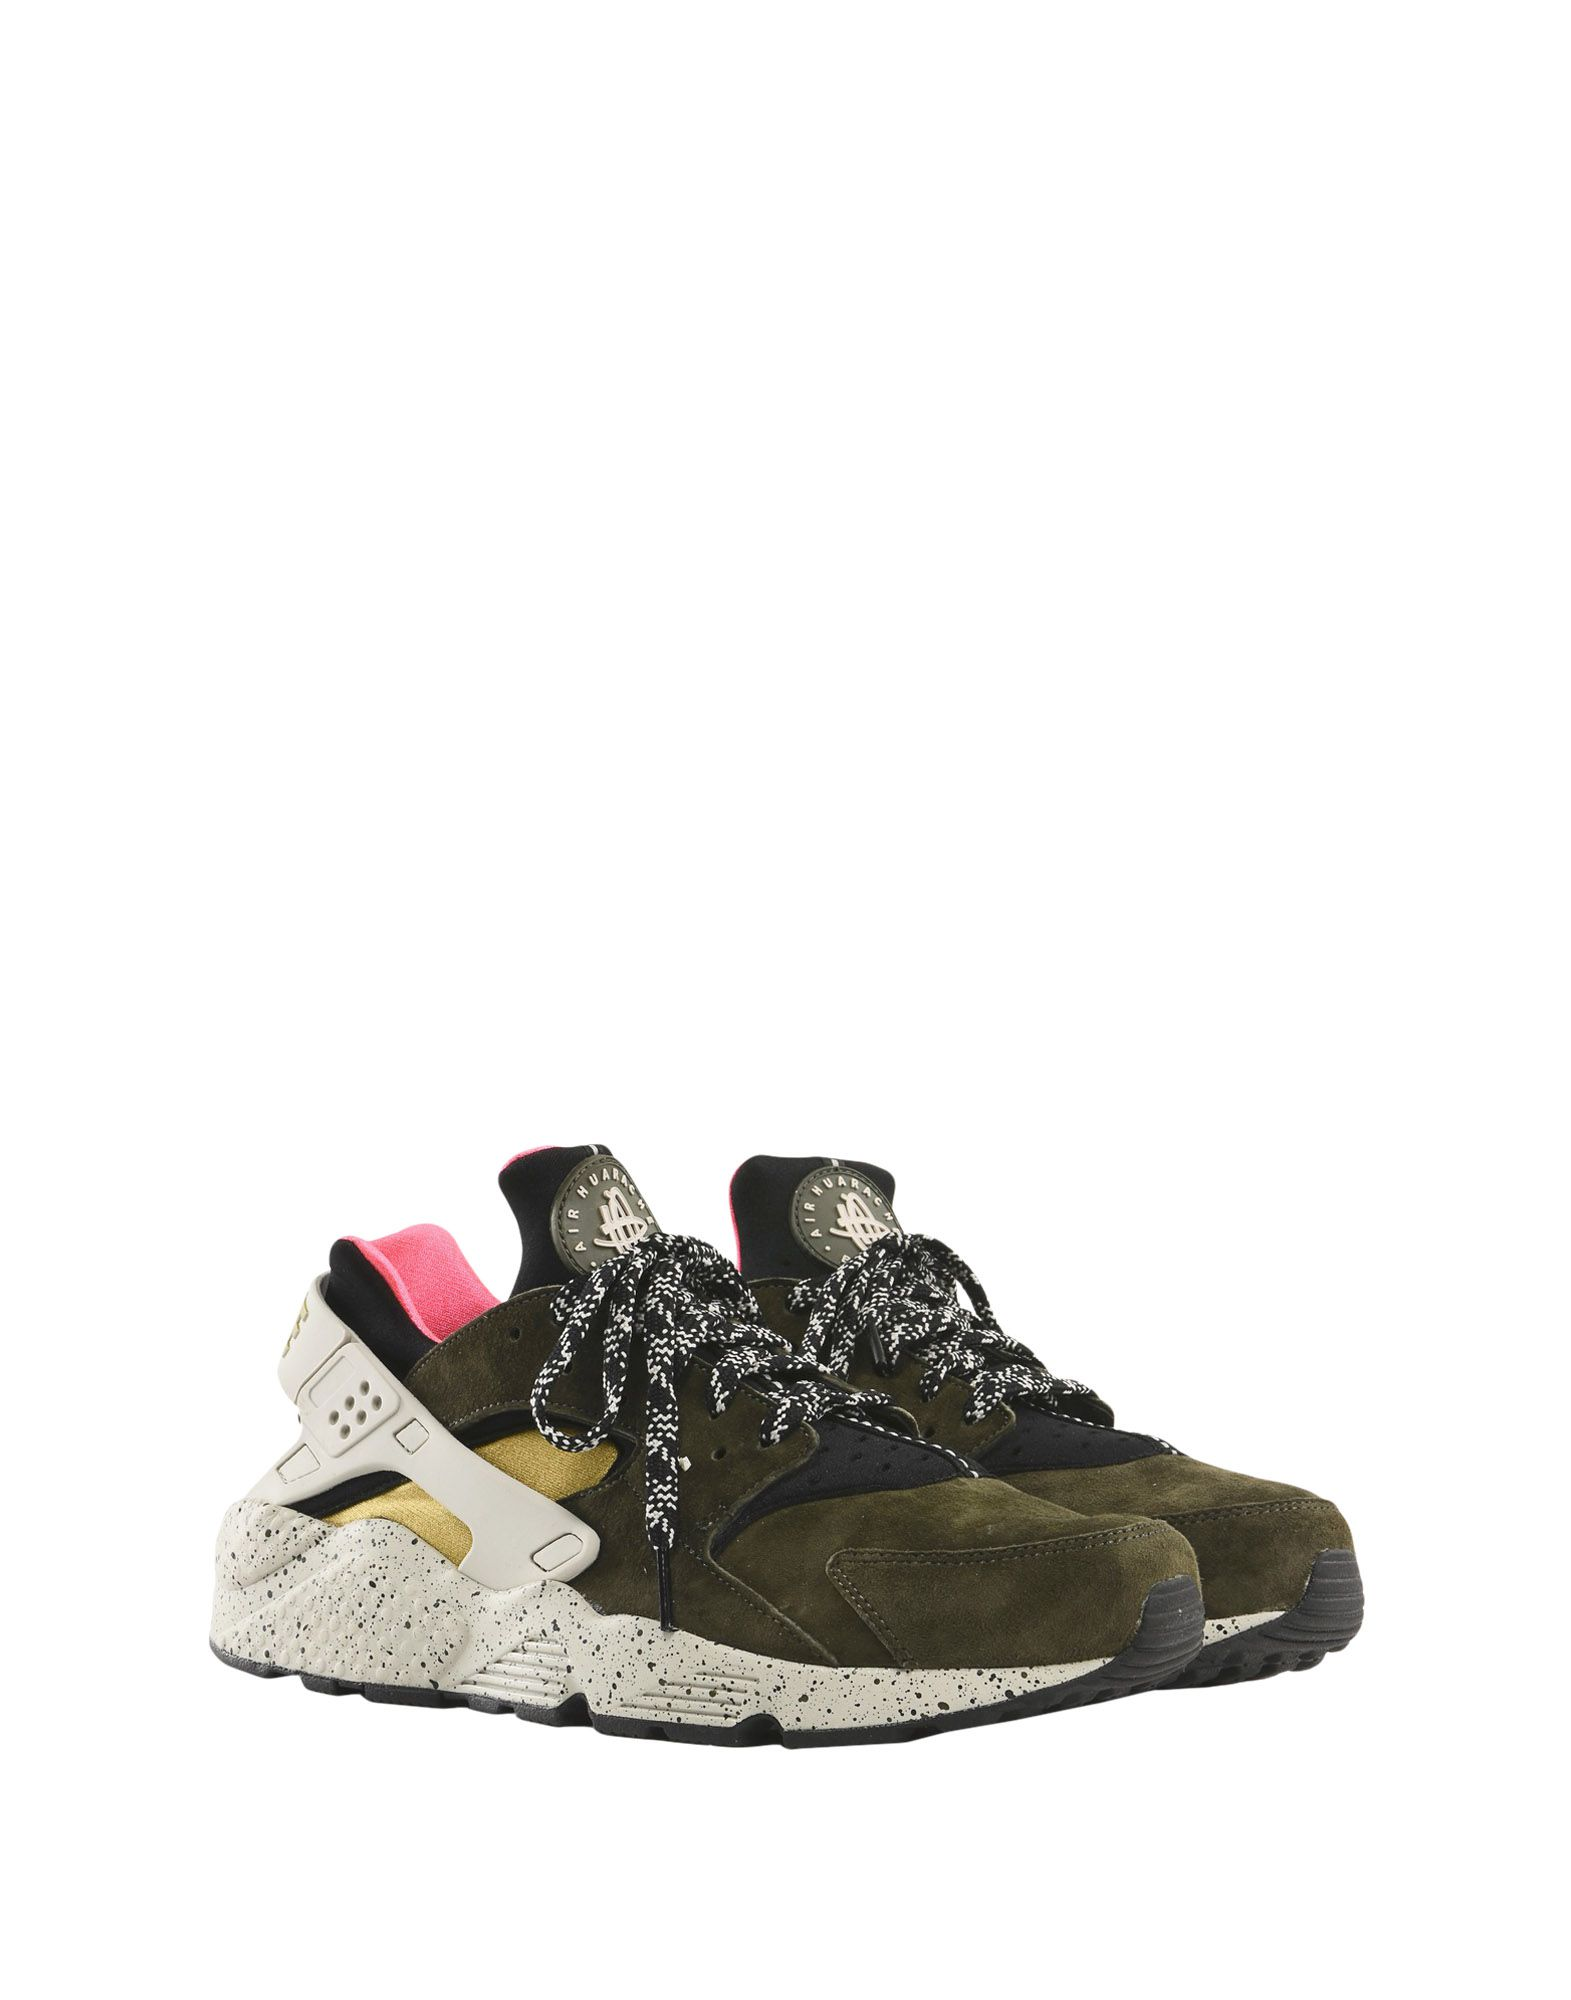 Sneakers Nike Air Huarache Run Premium - Homme - Sneakers Nike sur